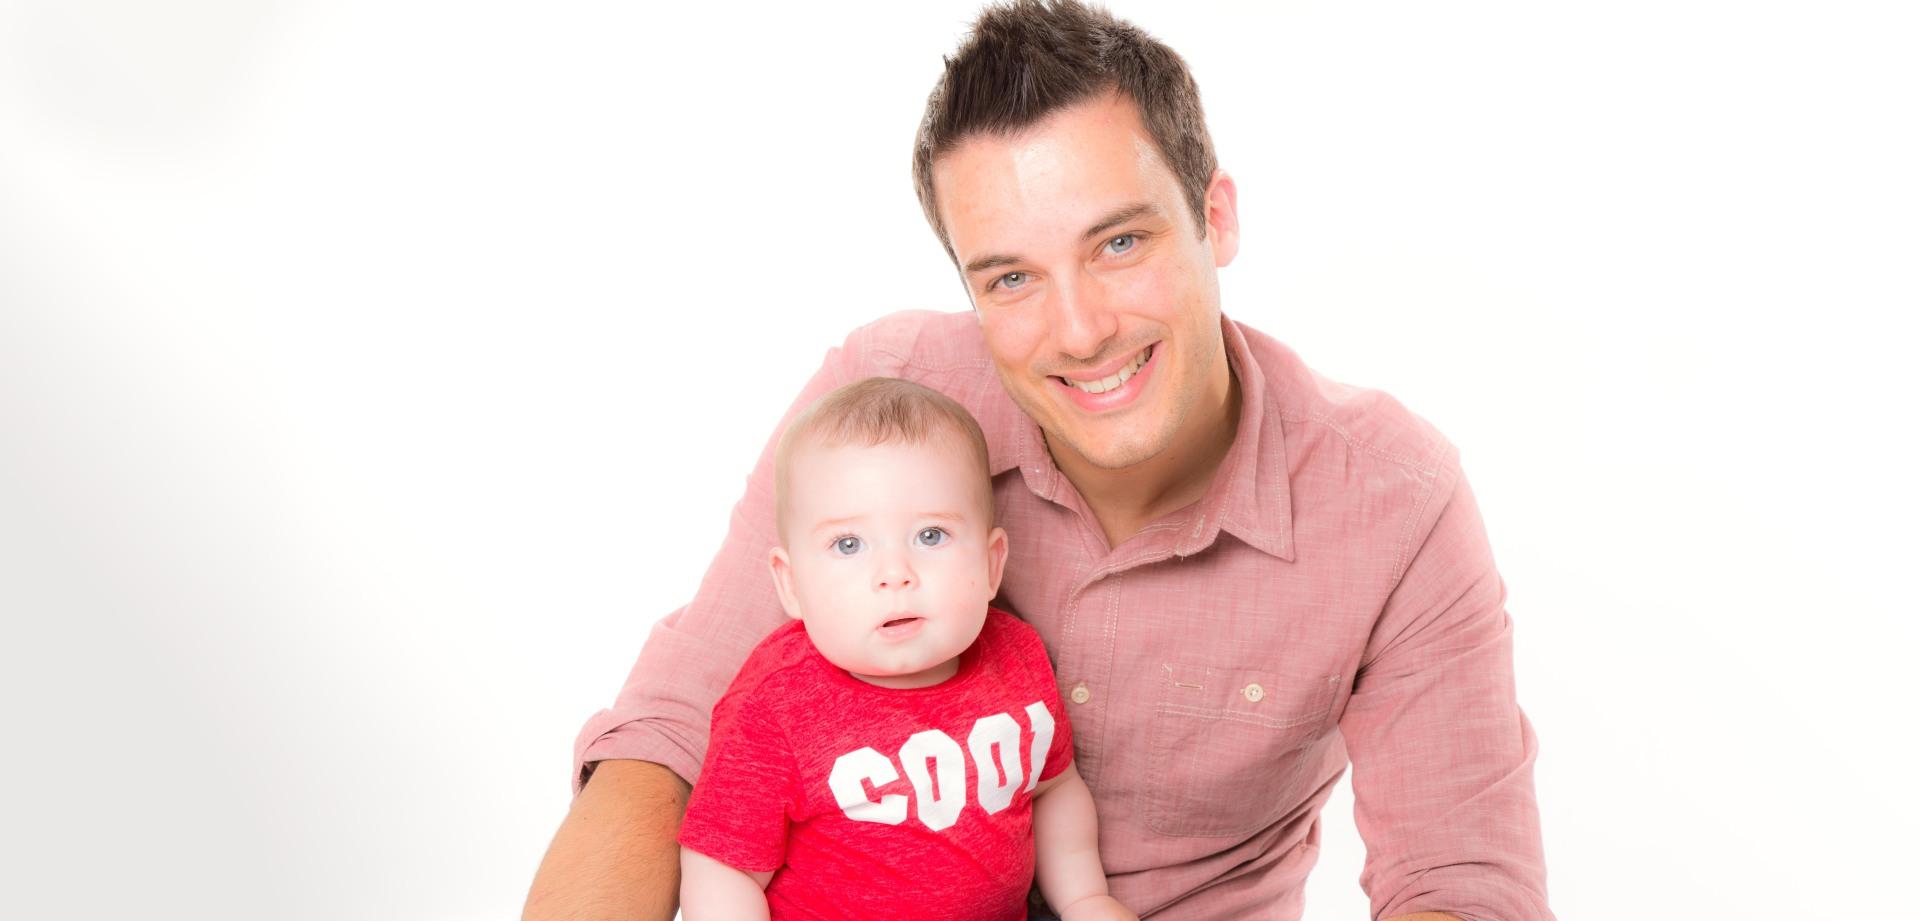 Chris Turton Family Portrait Photography